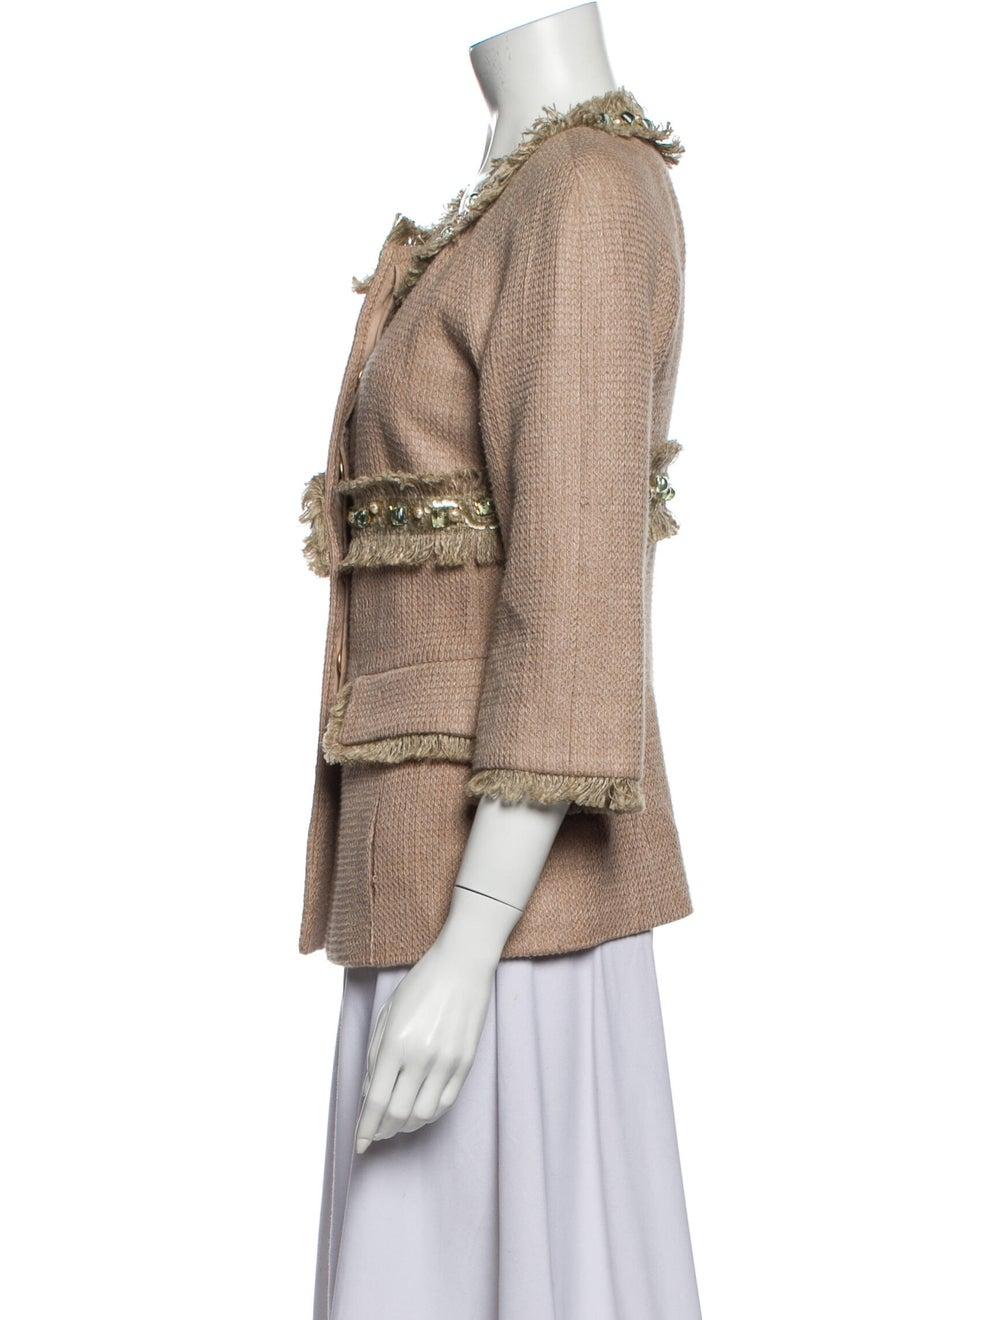 Chanel 2018 Linen Evening Jacket - image 2